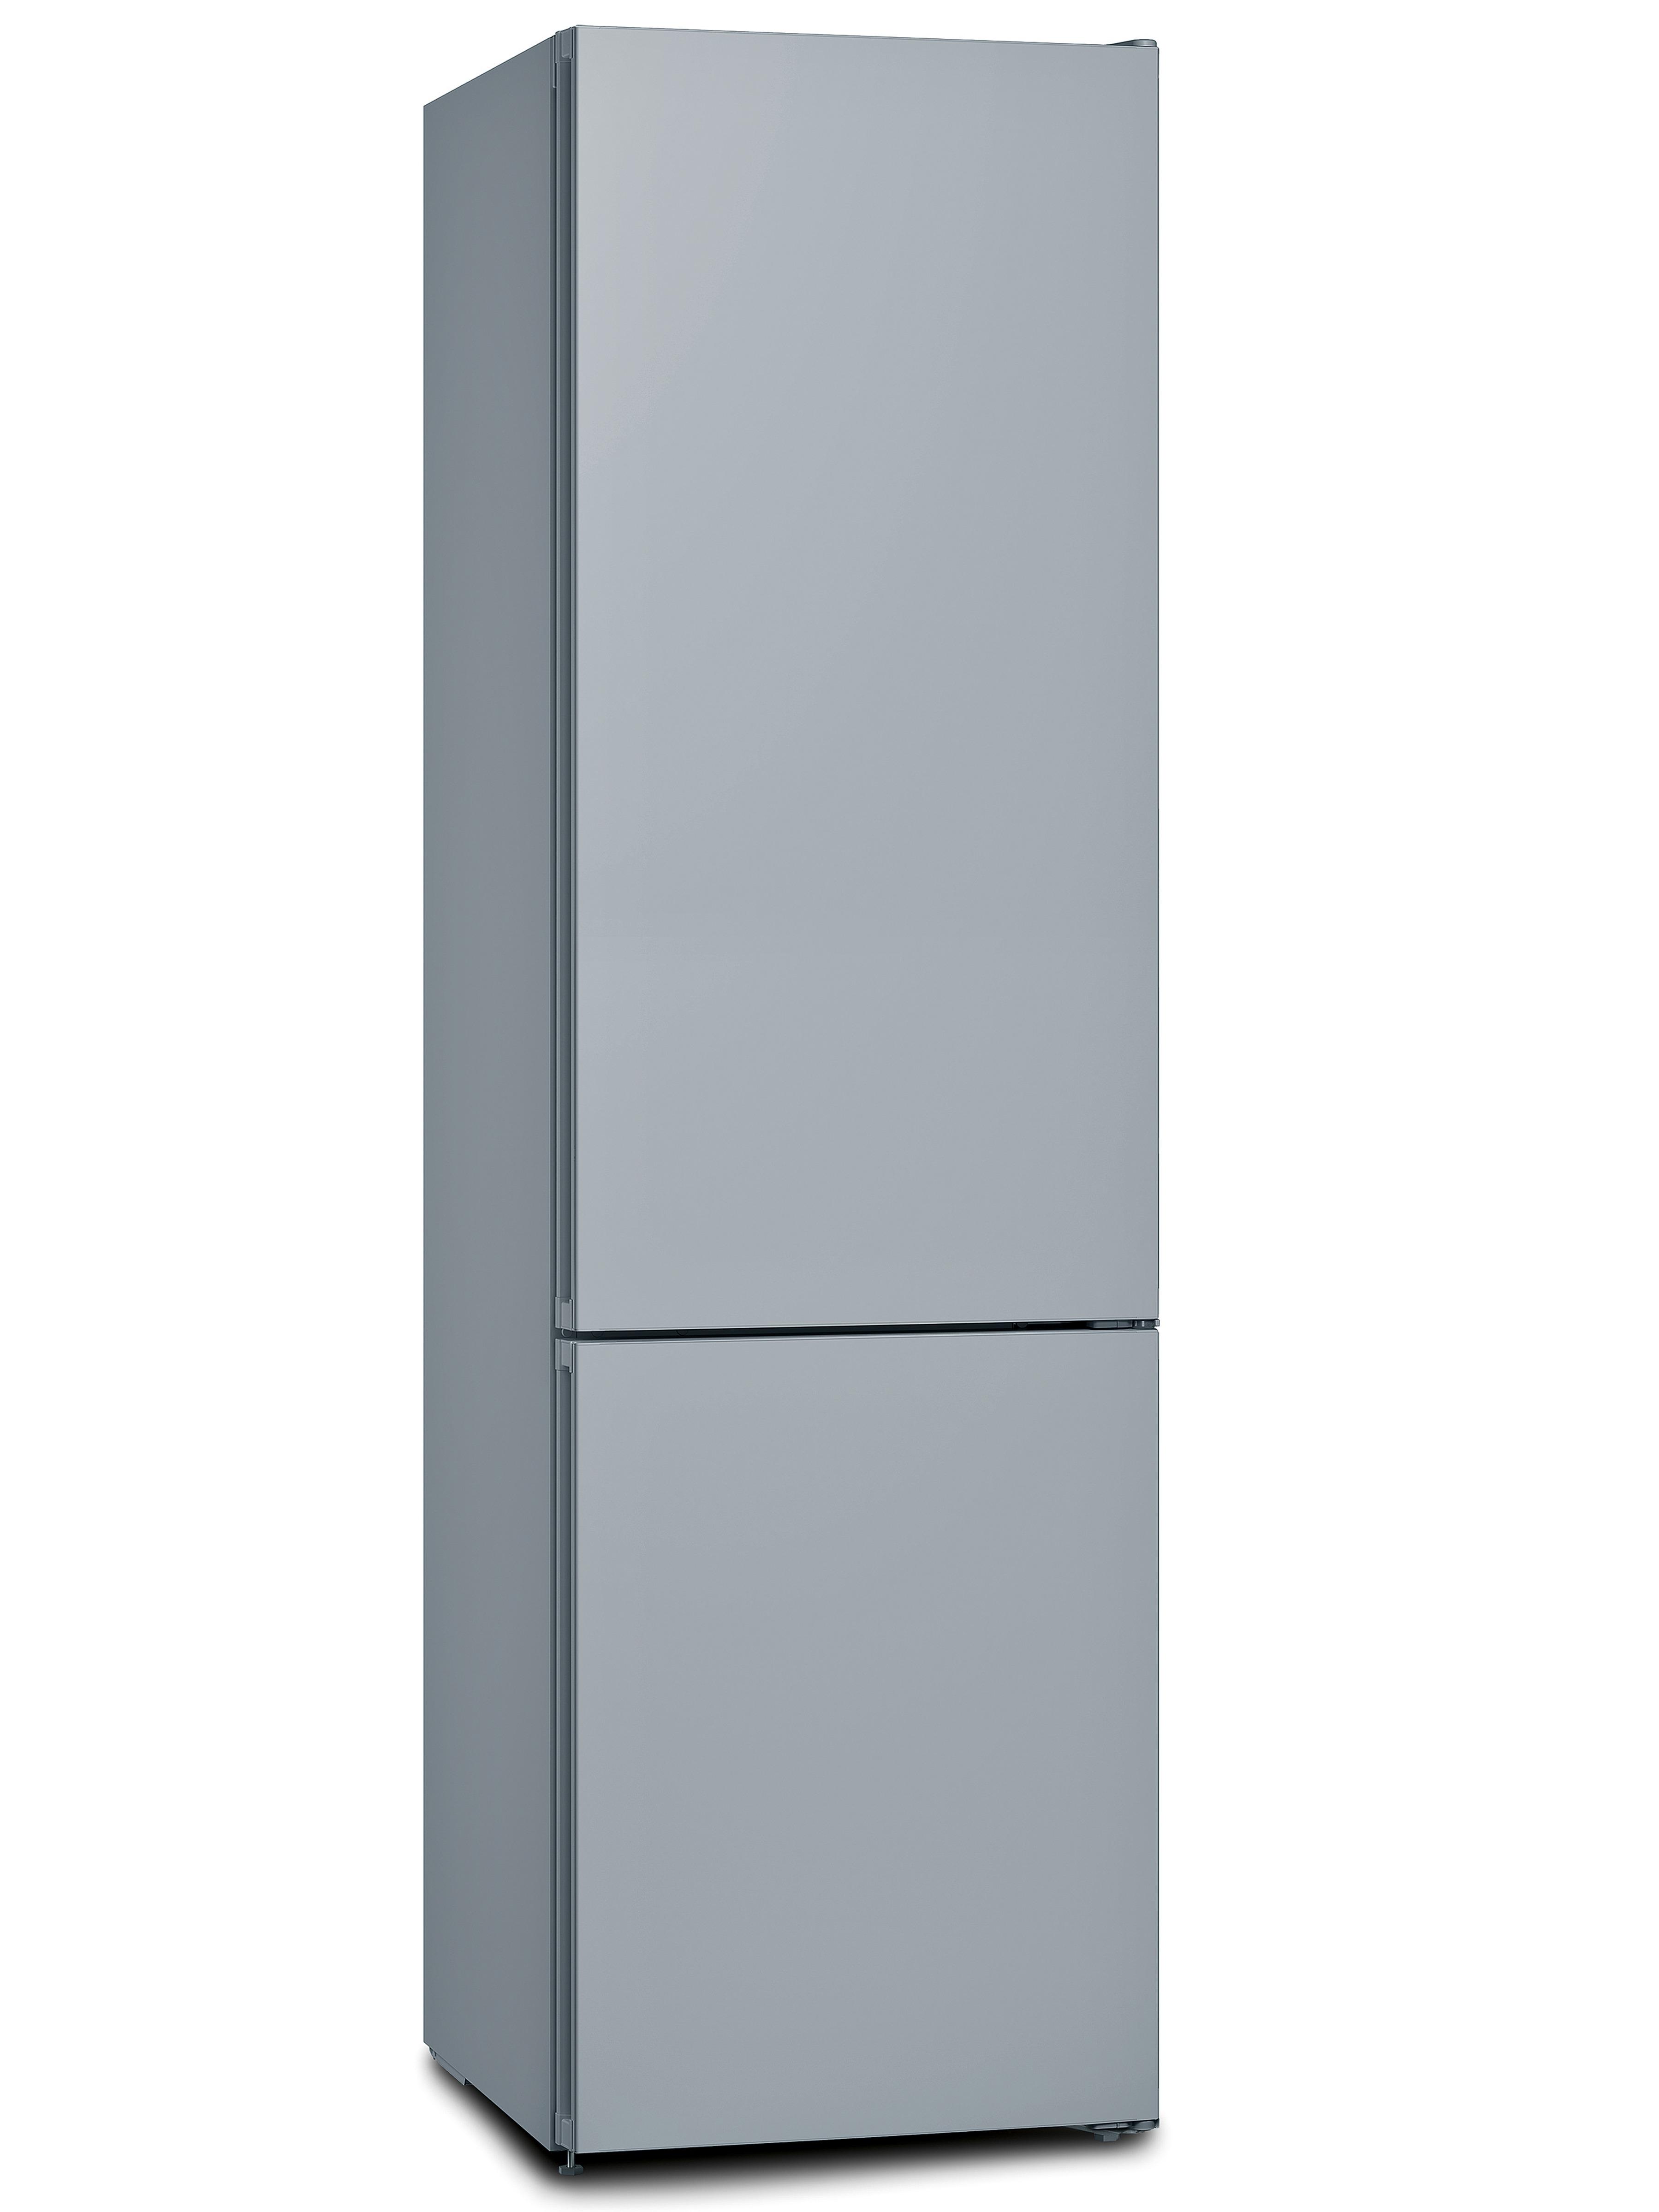 Bosch KGN39IJ4A koelkast met vriesvak